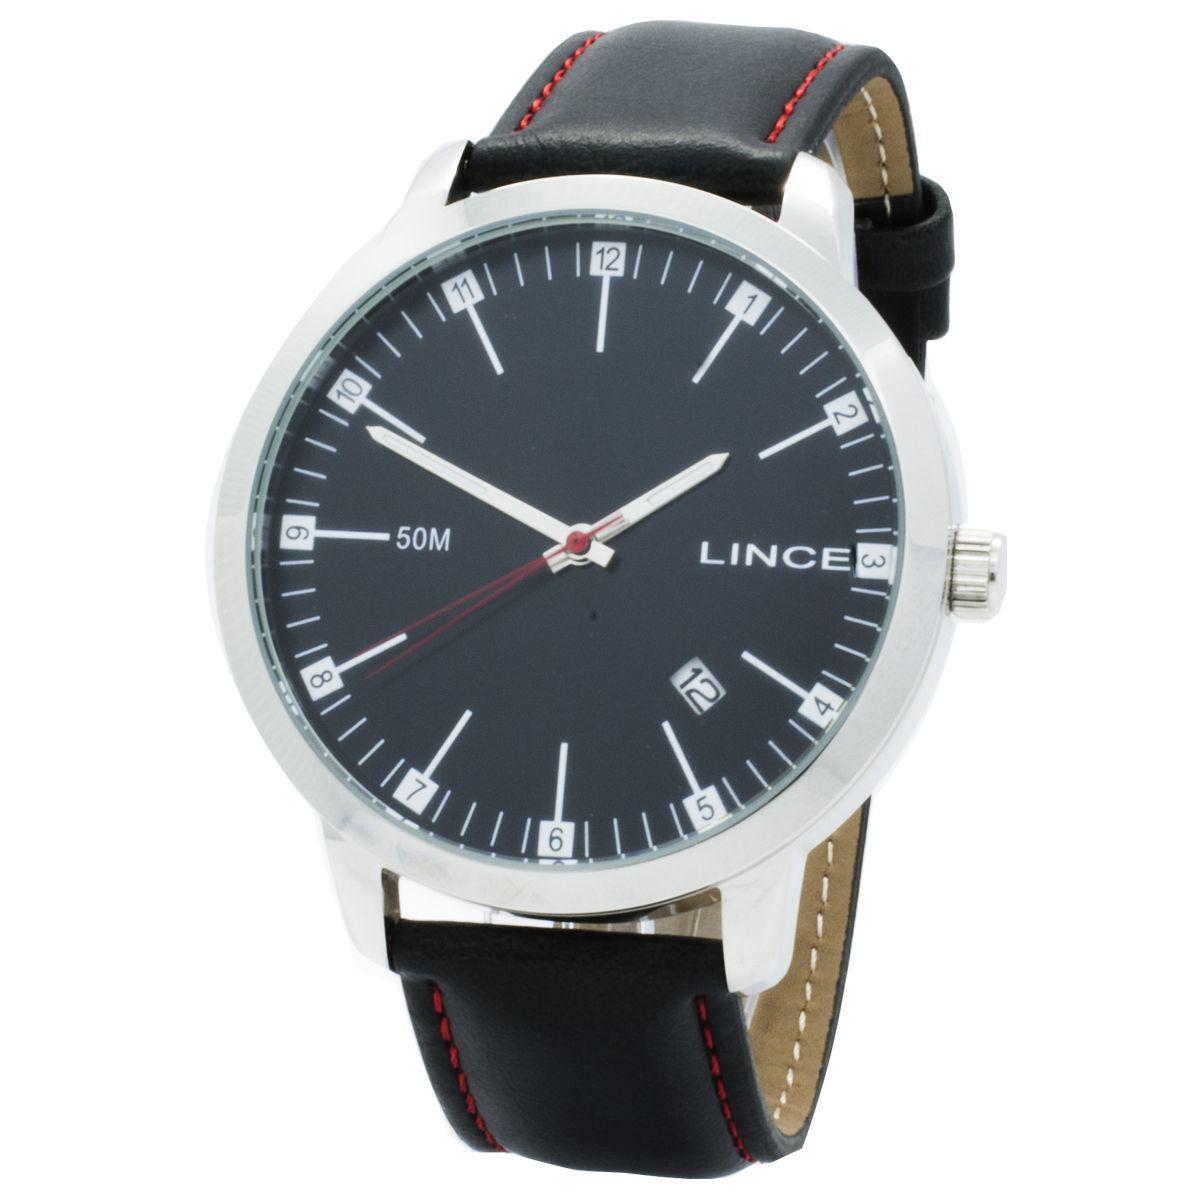 2158f2cf38e Relógio de Pulso Lince Masculino com Pulseira de Couro MRC4349S P2PV -  Prata e Preto